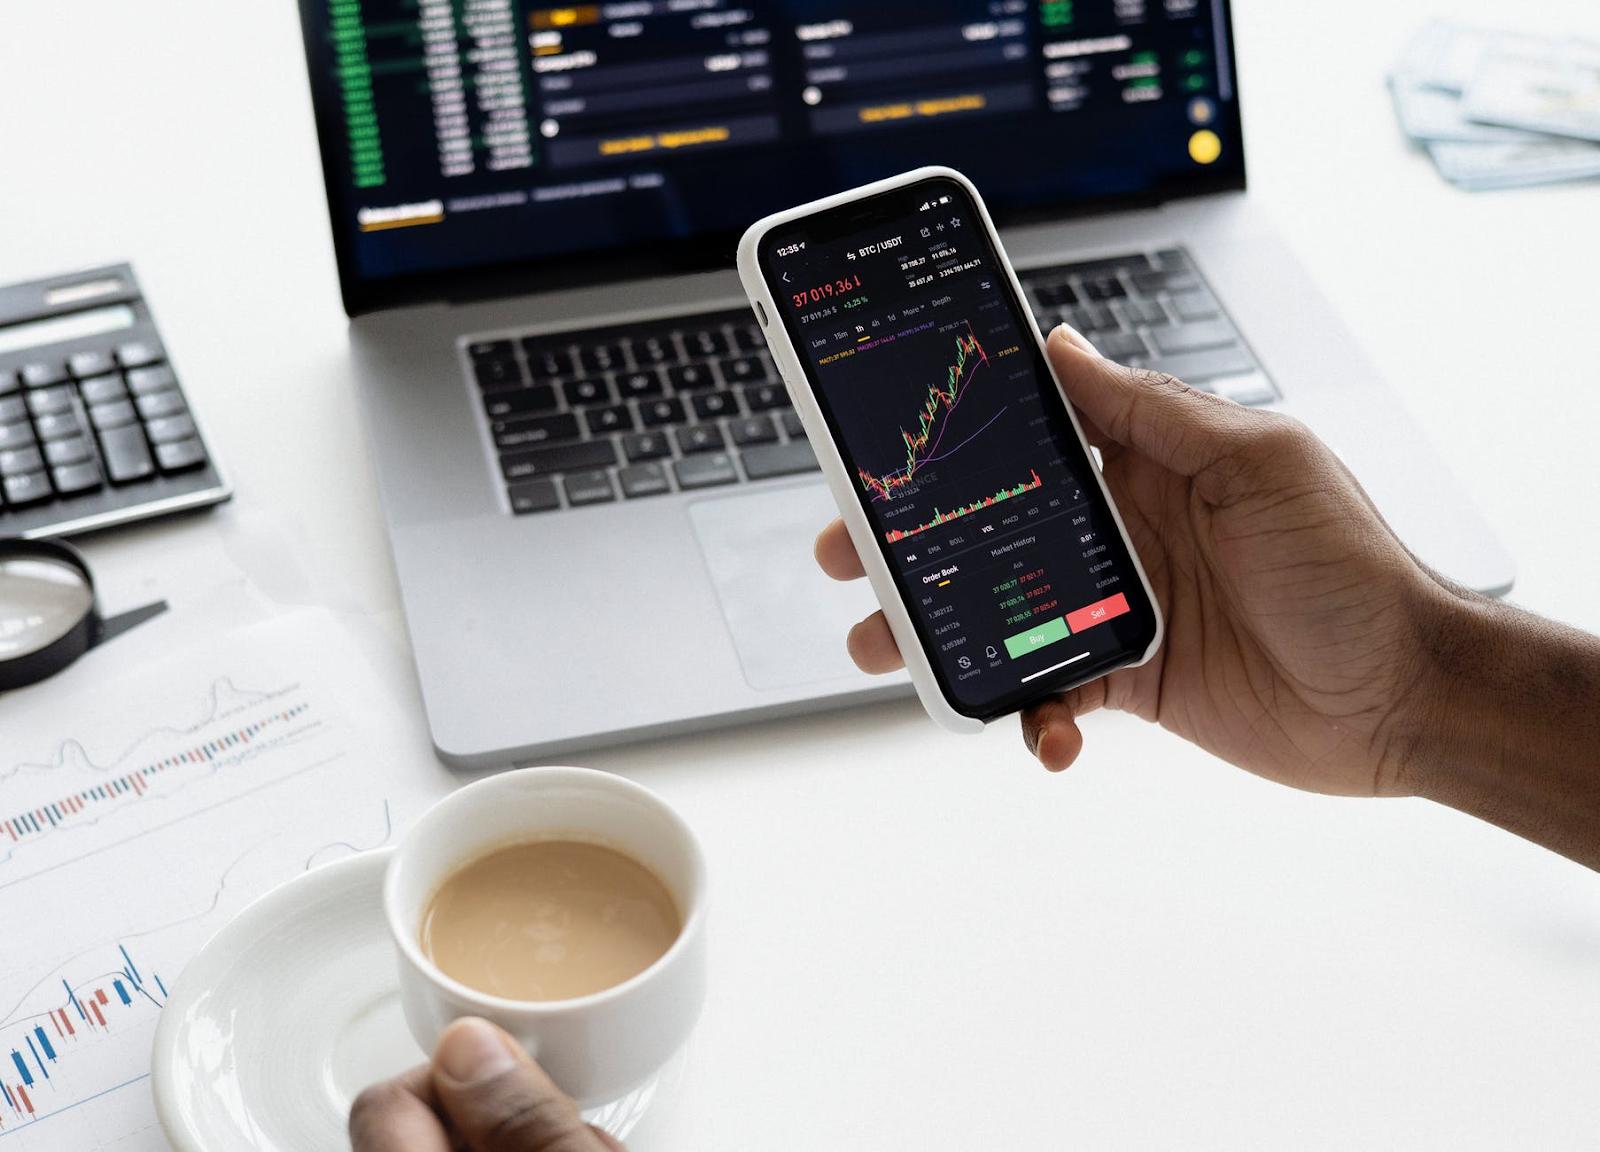 graph trend chart on phone,laptop, Digital marketing strategies